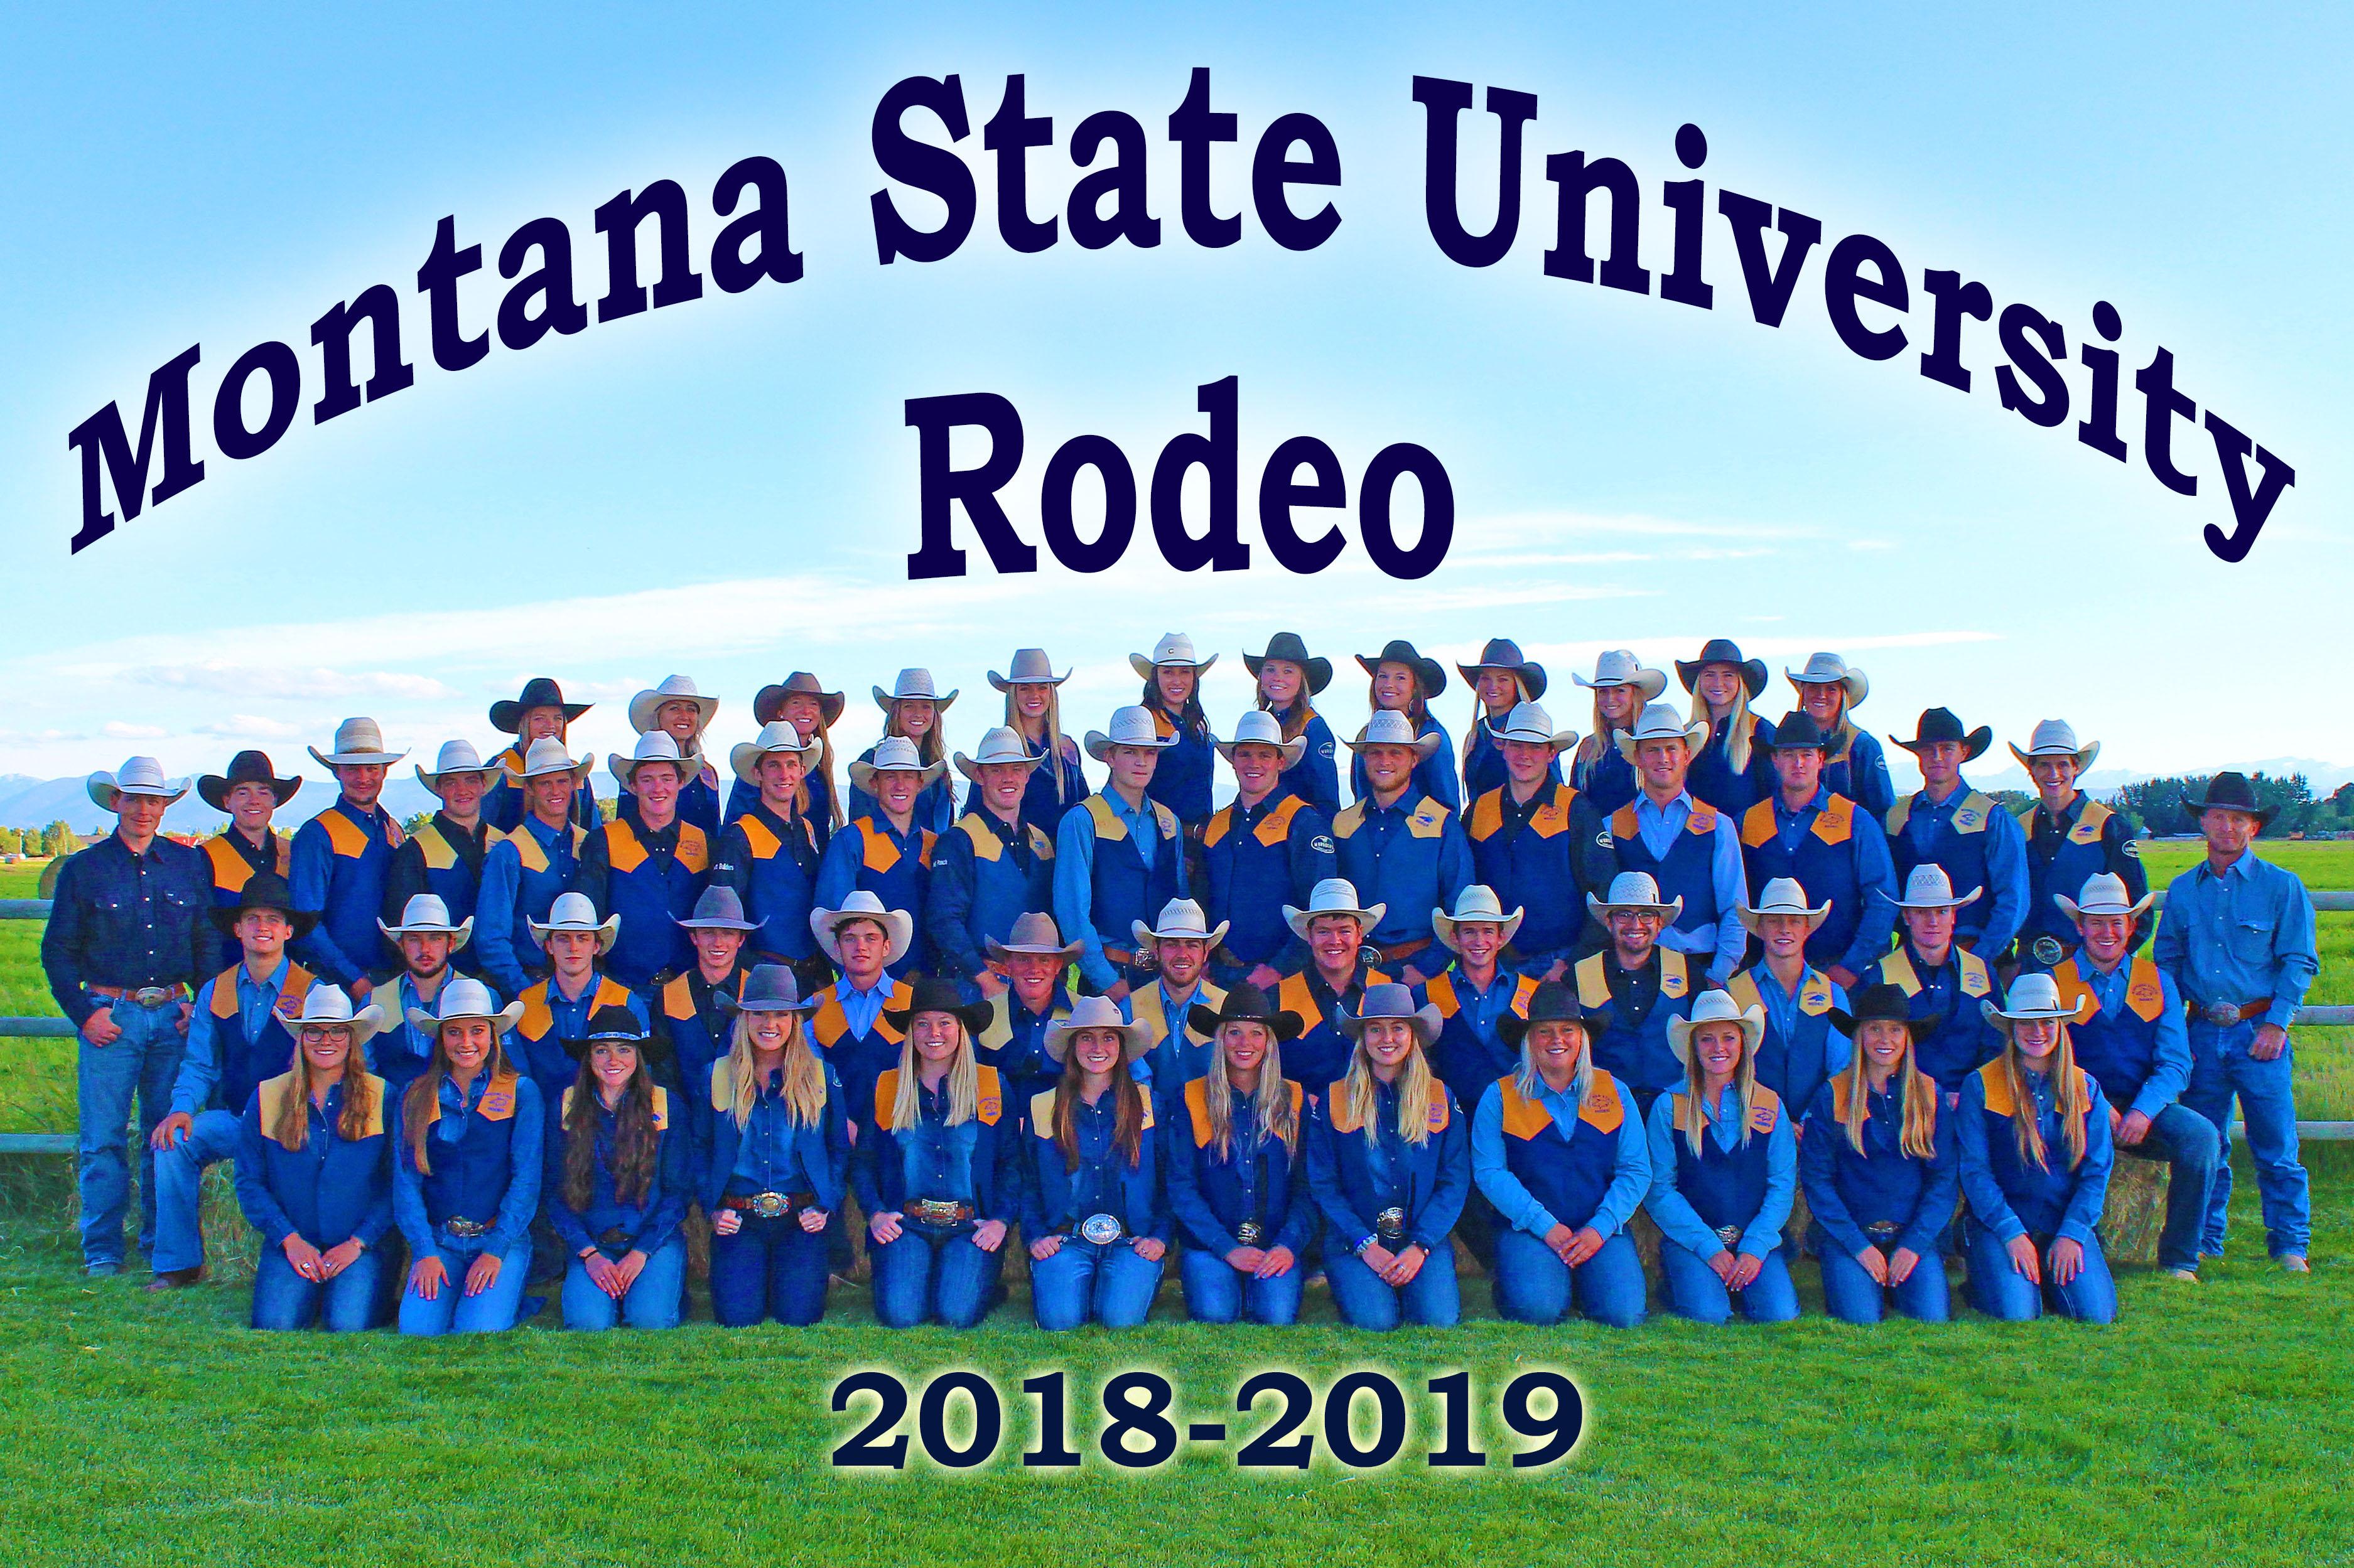 Bobcat Rodeo Team Bobcat Rodeo Office Montana State